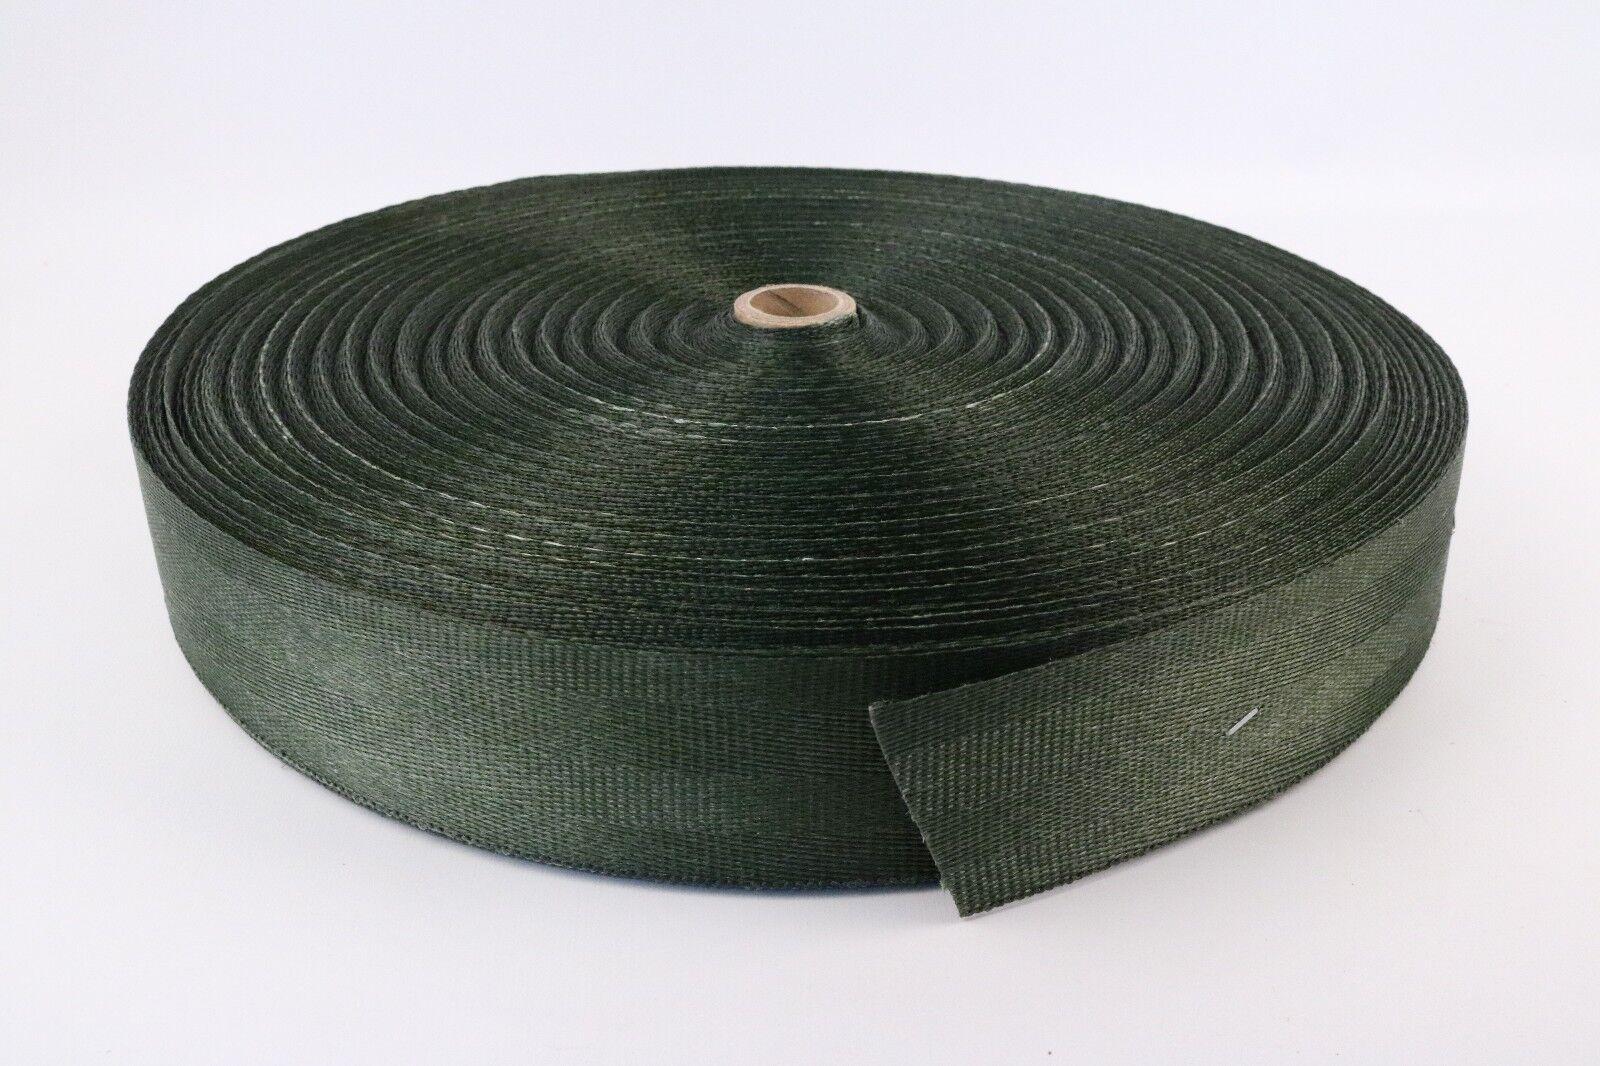 5x Webbing Green Nylon Strapping Strap Outdoor 175 Yards x 2  W